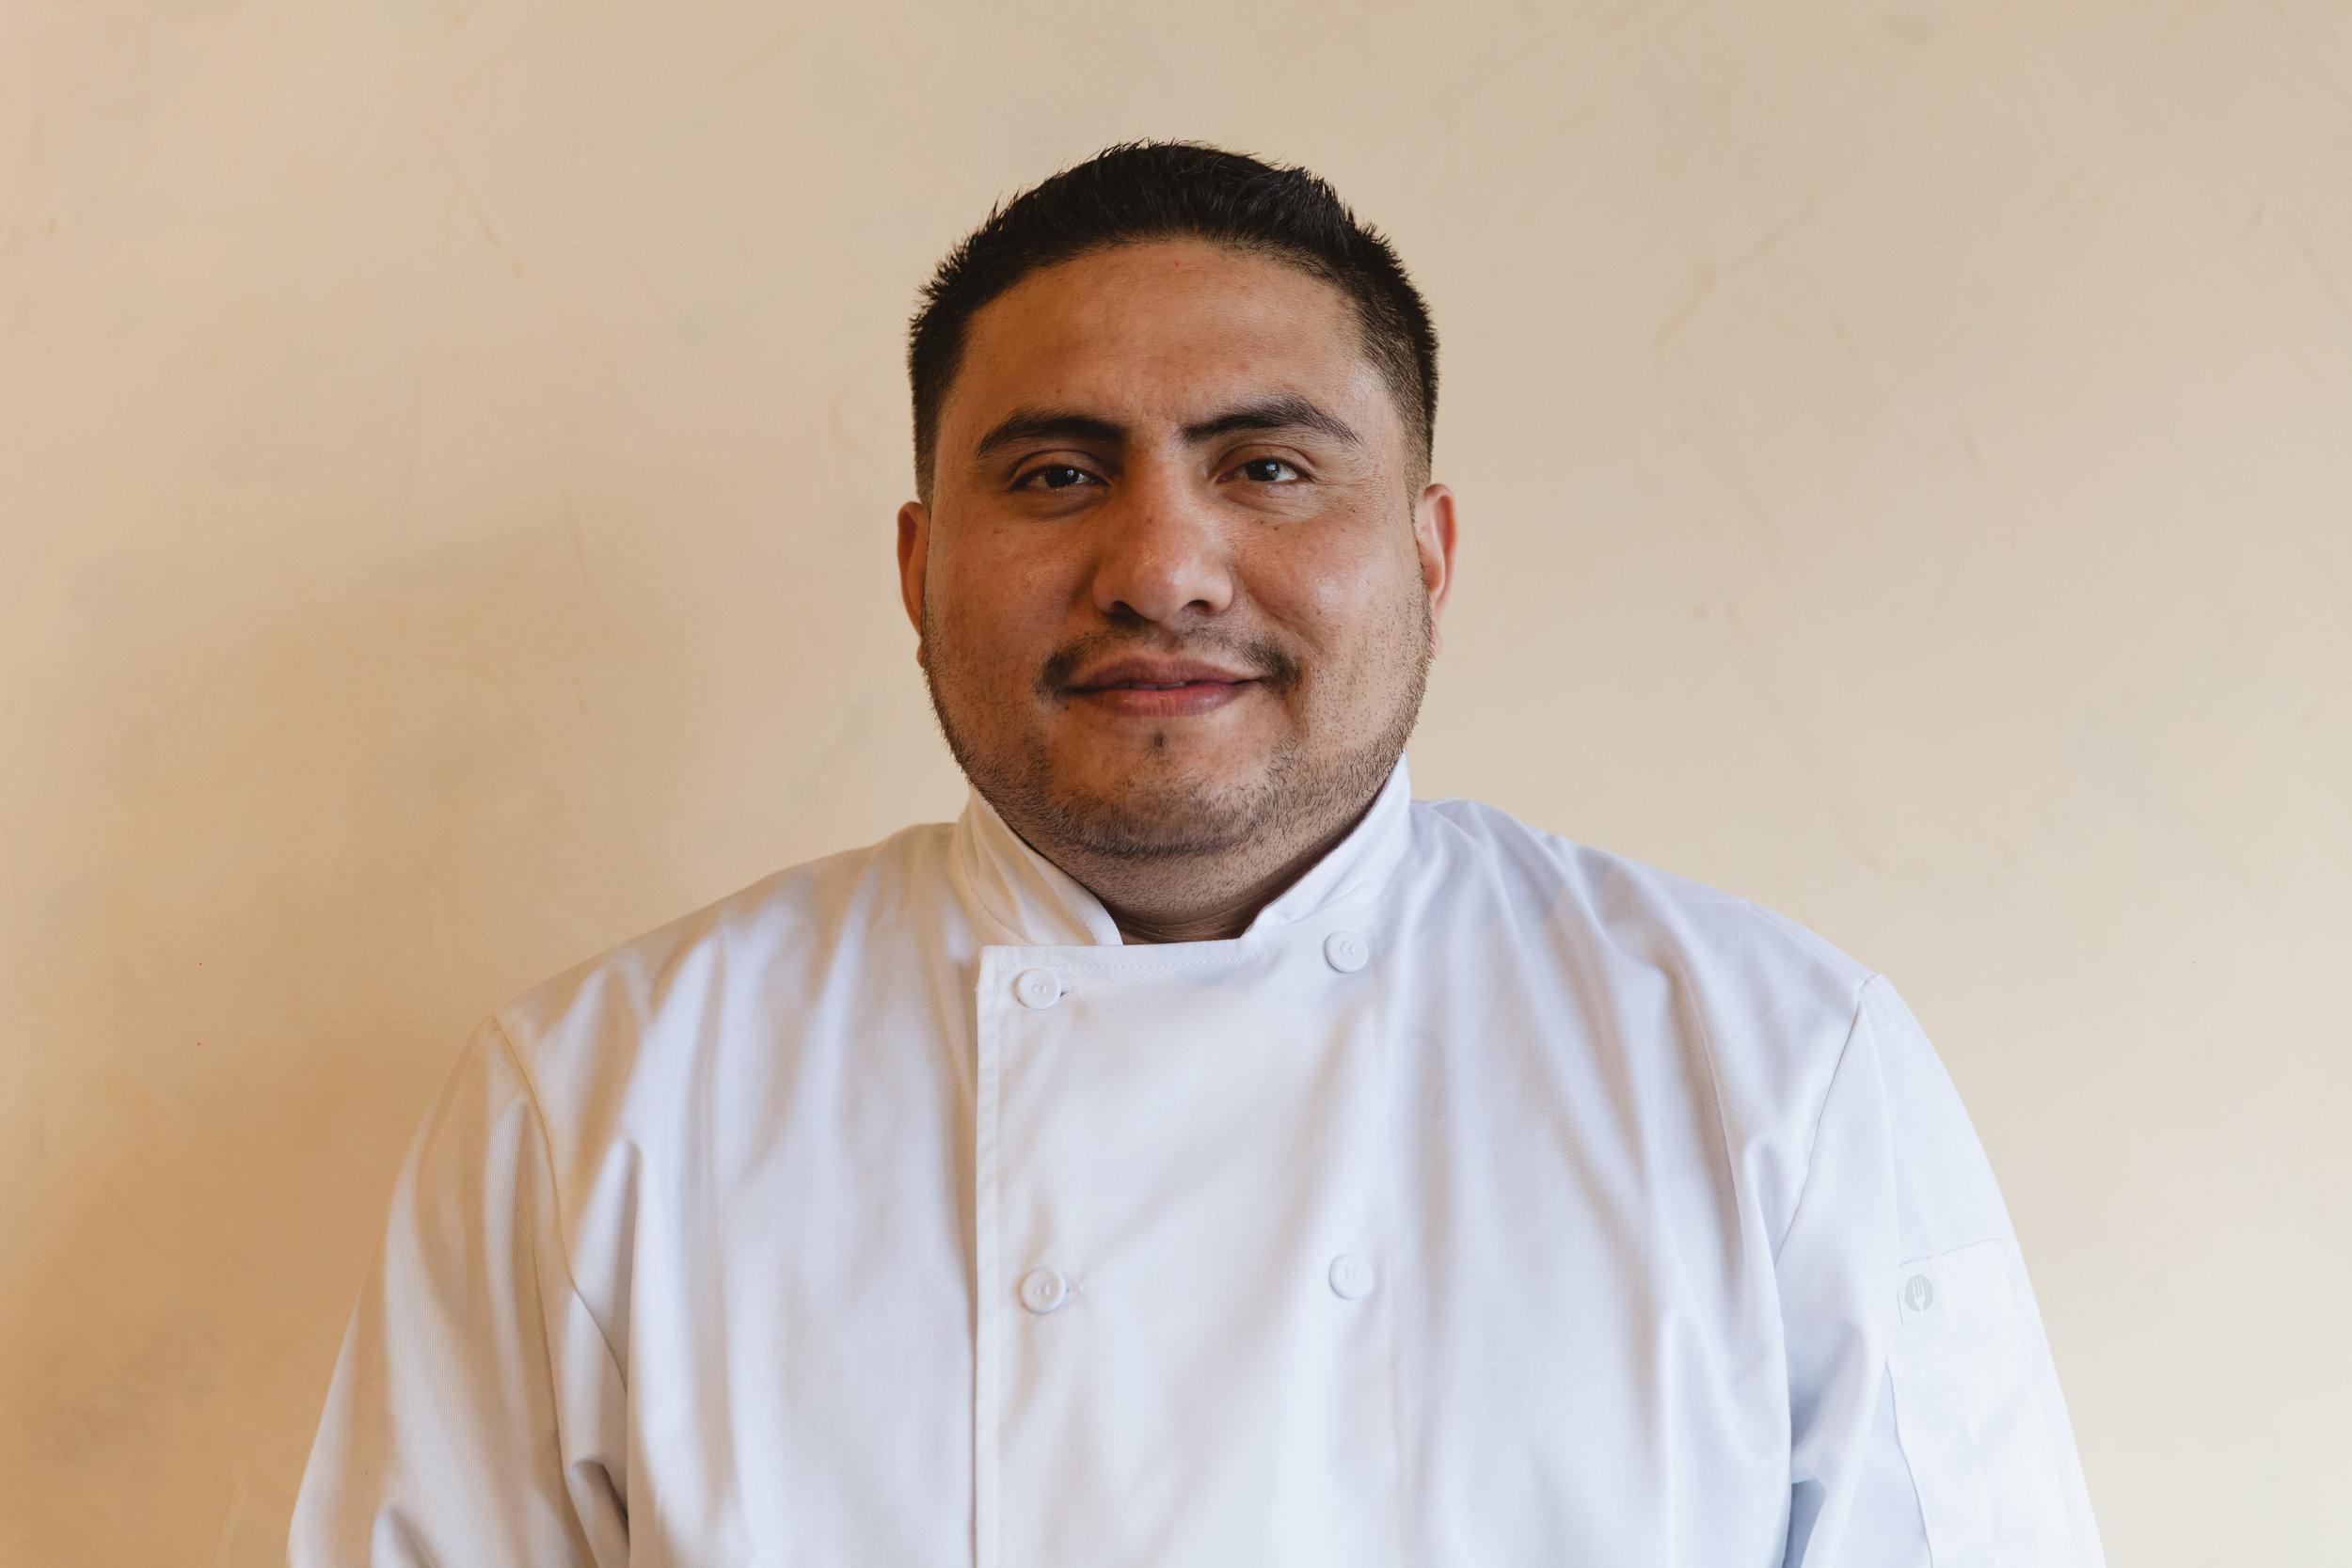 Efraen  Pastry Chef